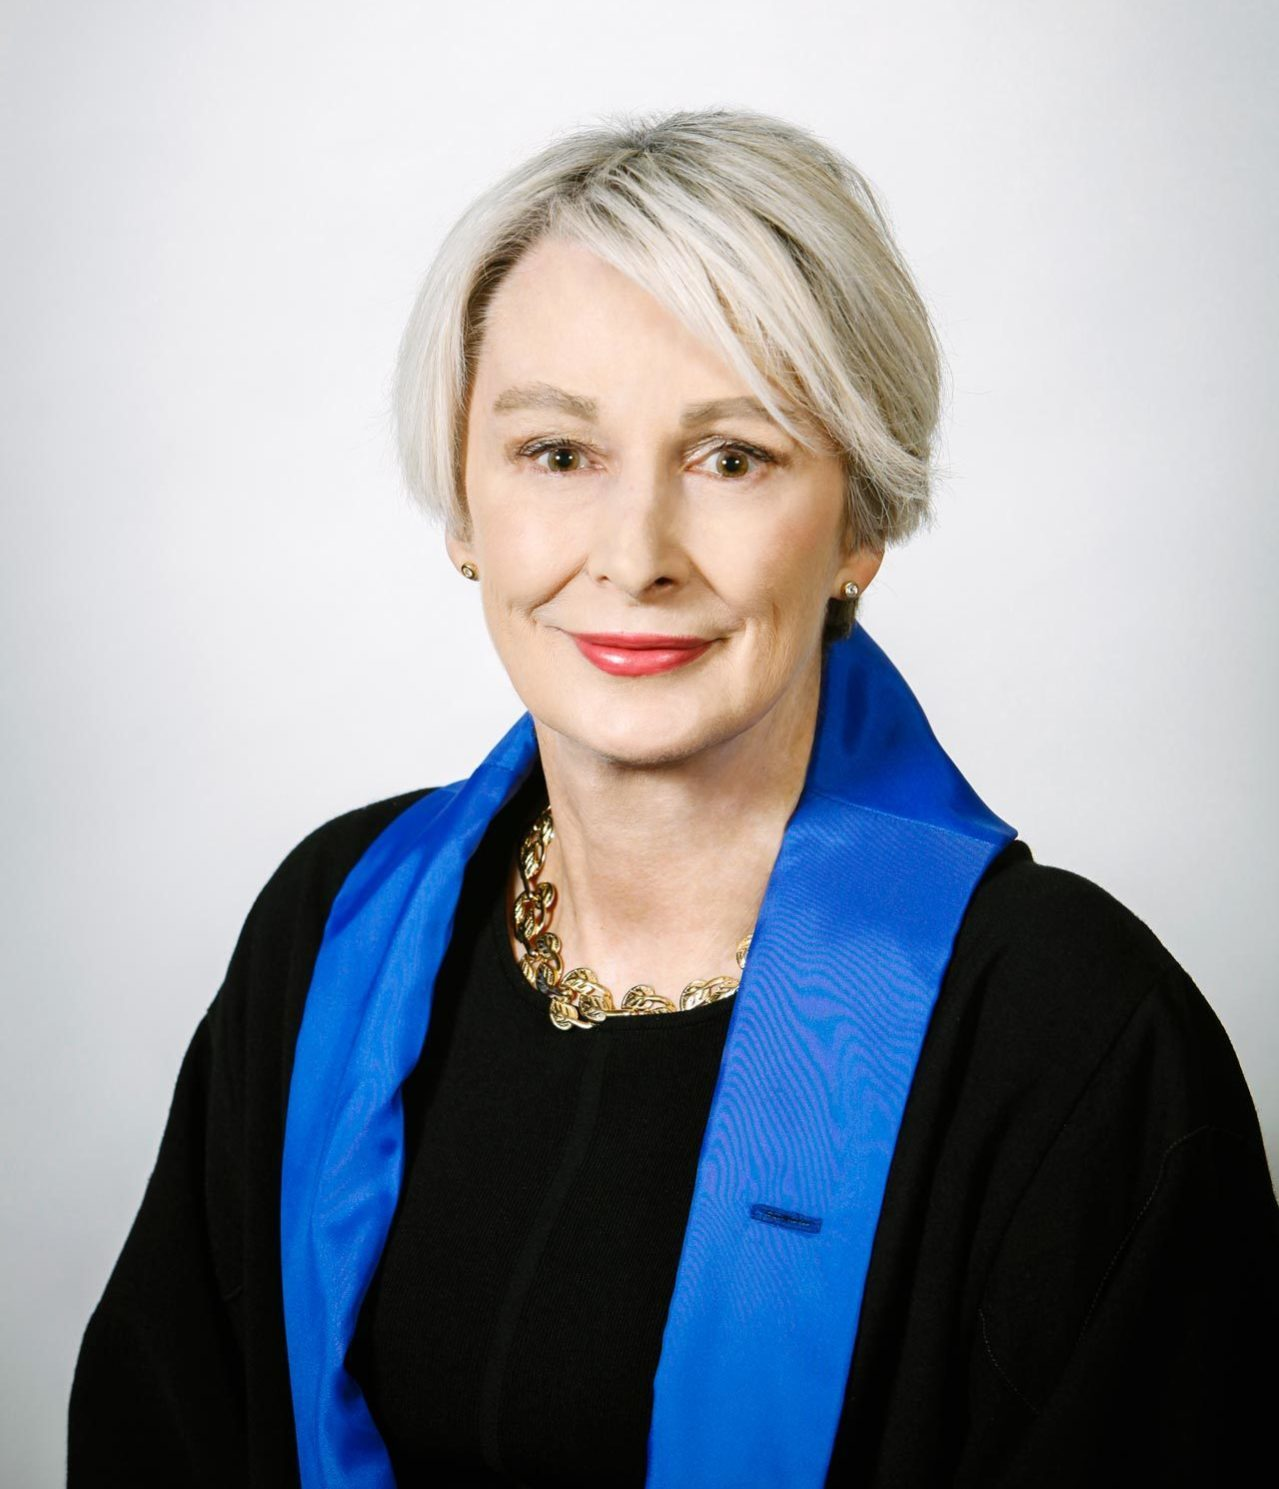 Councillor Anne Moran